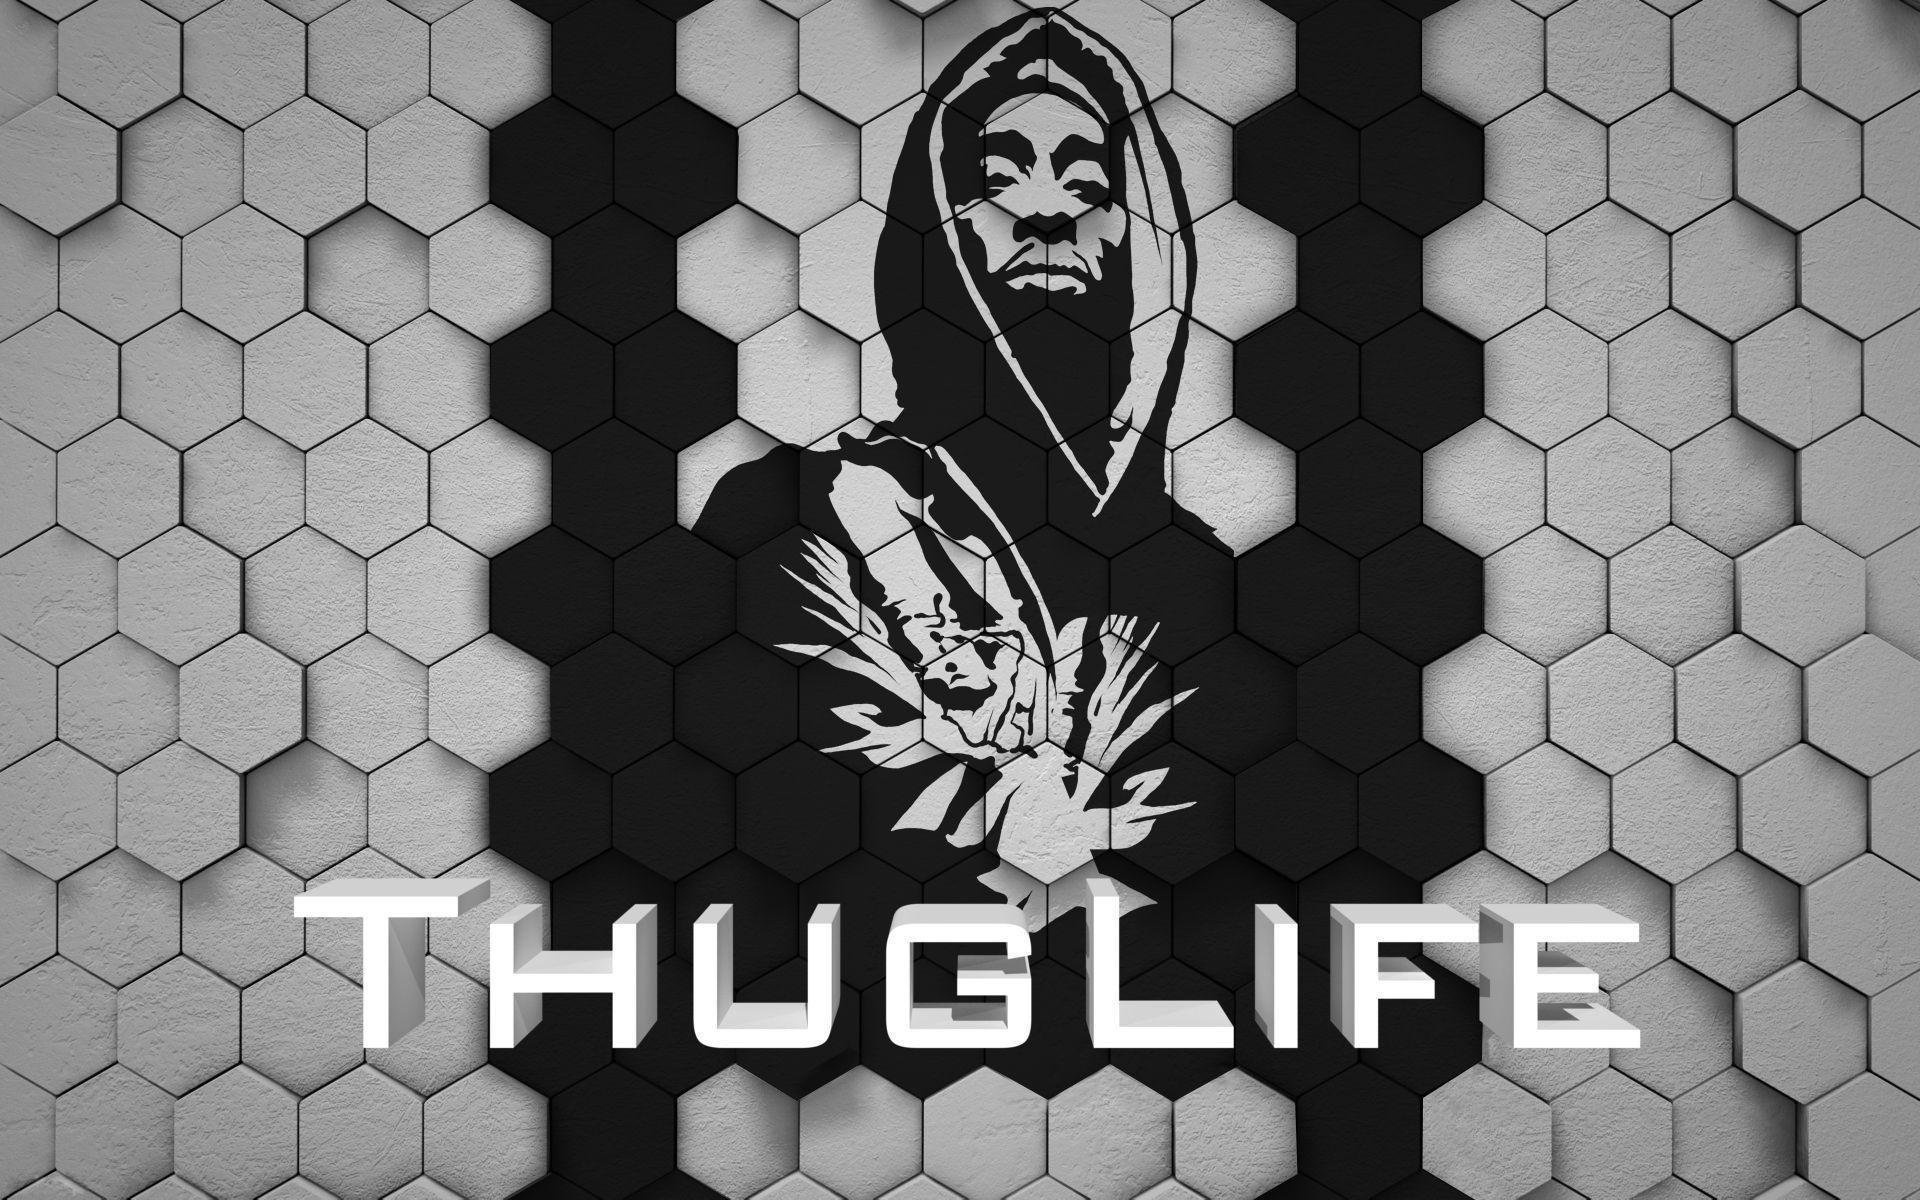 1920x1200 Images For Tupac Thug Life Wallpaper